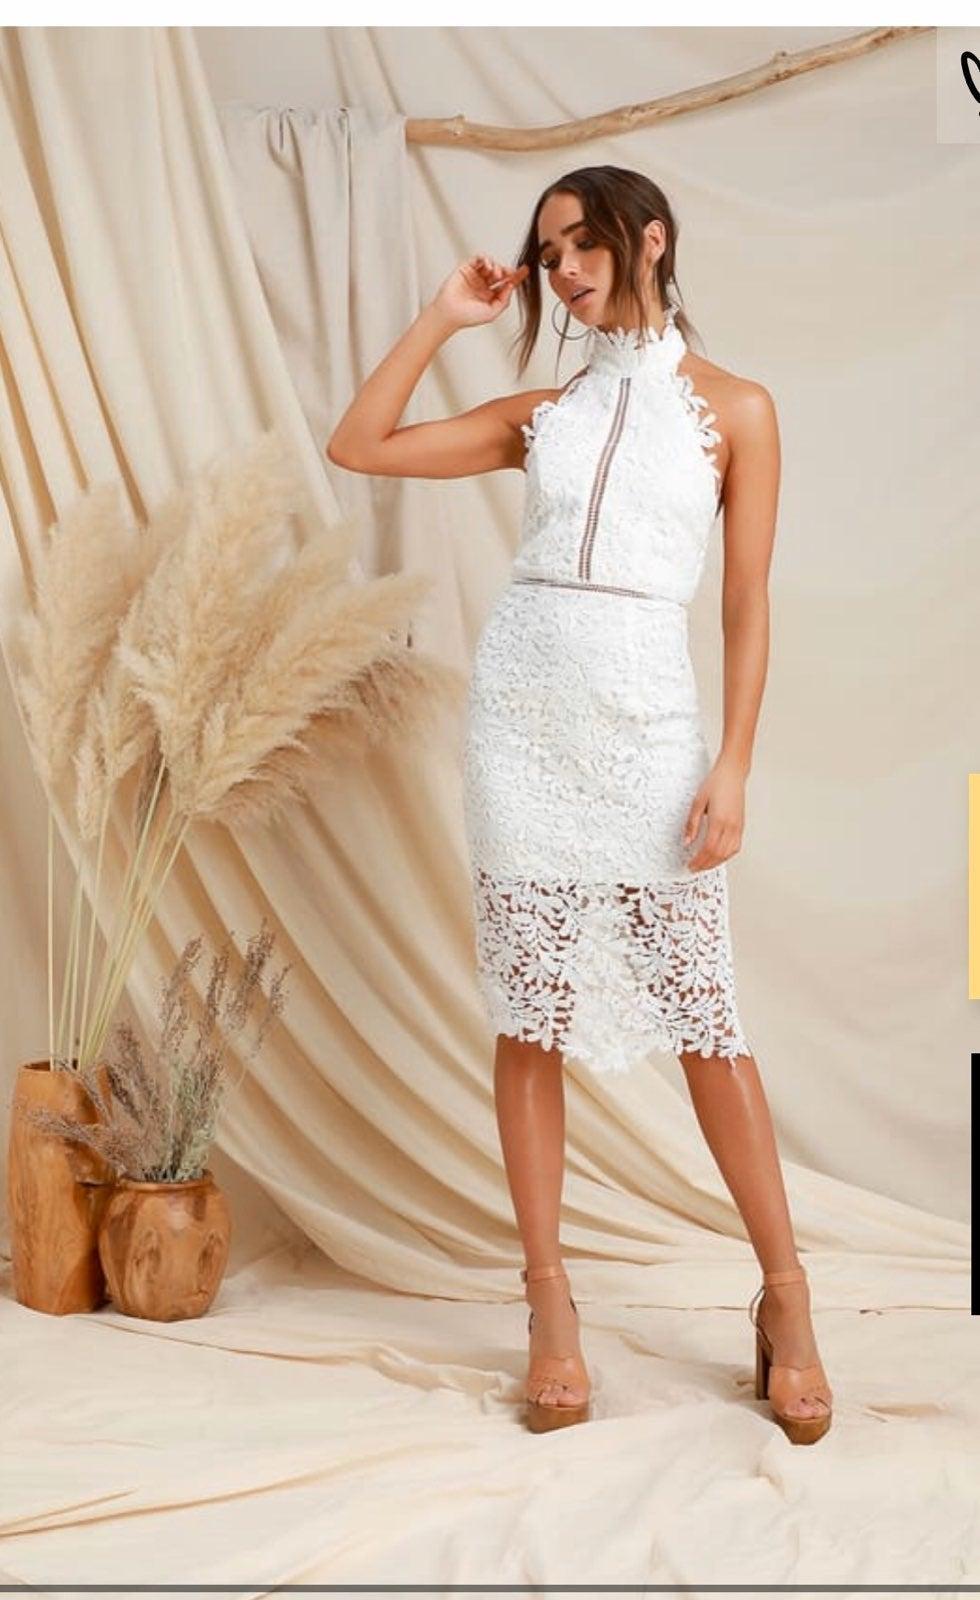 LuLus White Lace Backless Dress